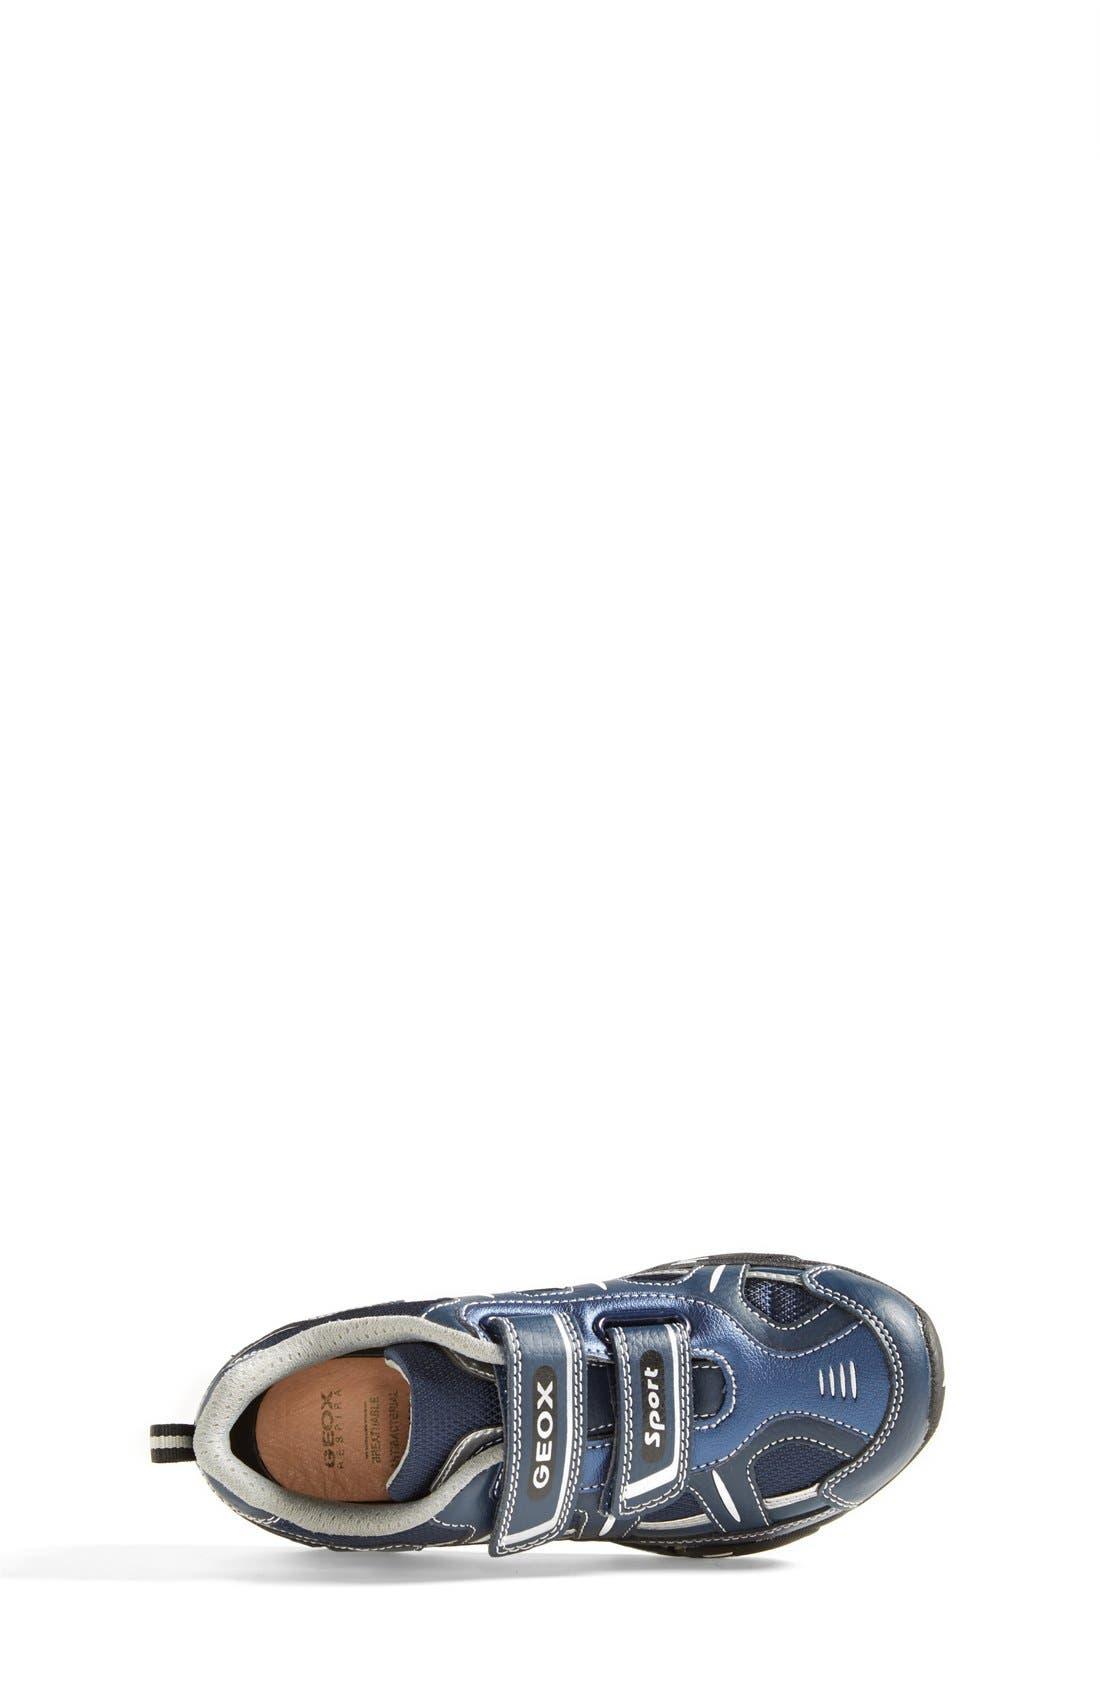 Alternate Image 3  - Geox 'Light Eclipse 18' Sneaker (Toddler, Little Kid & Big Kid)